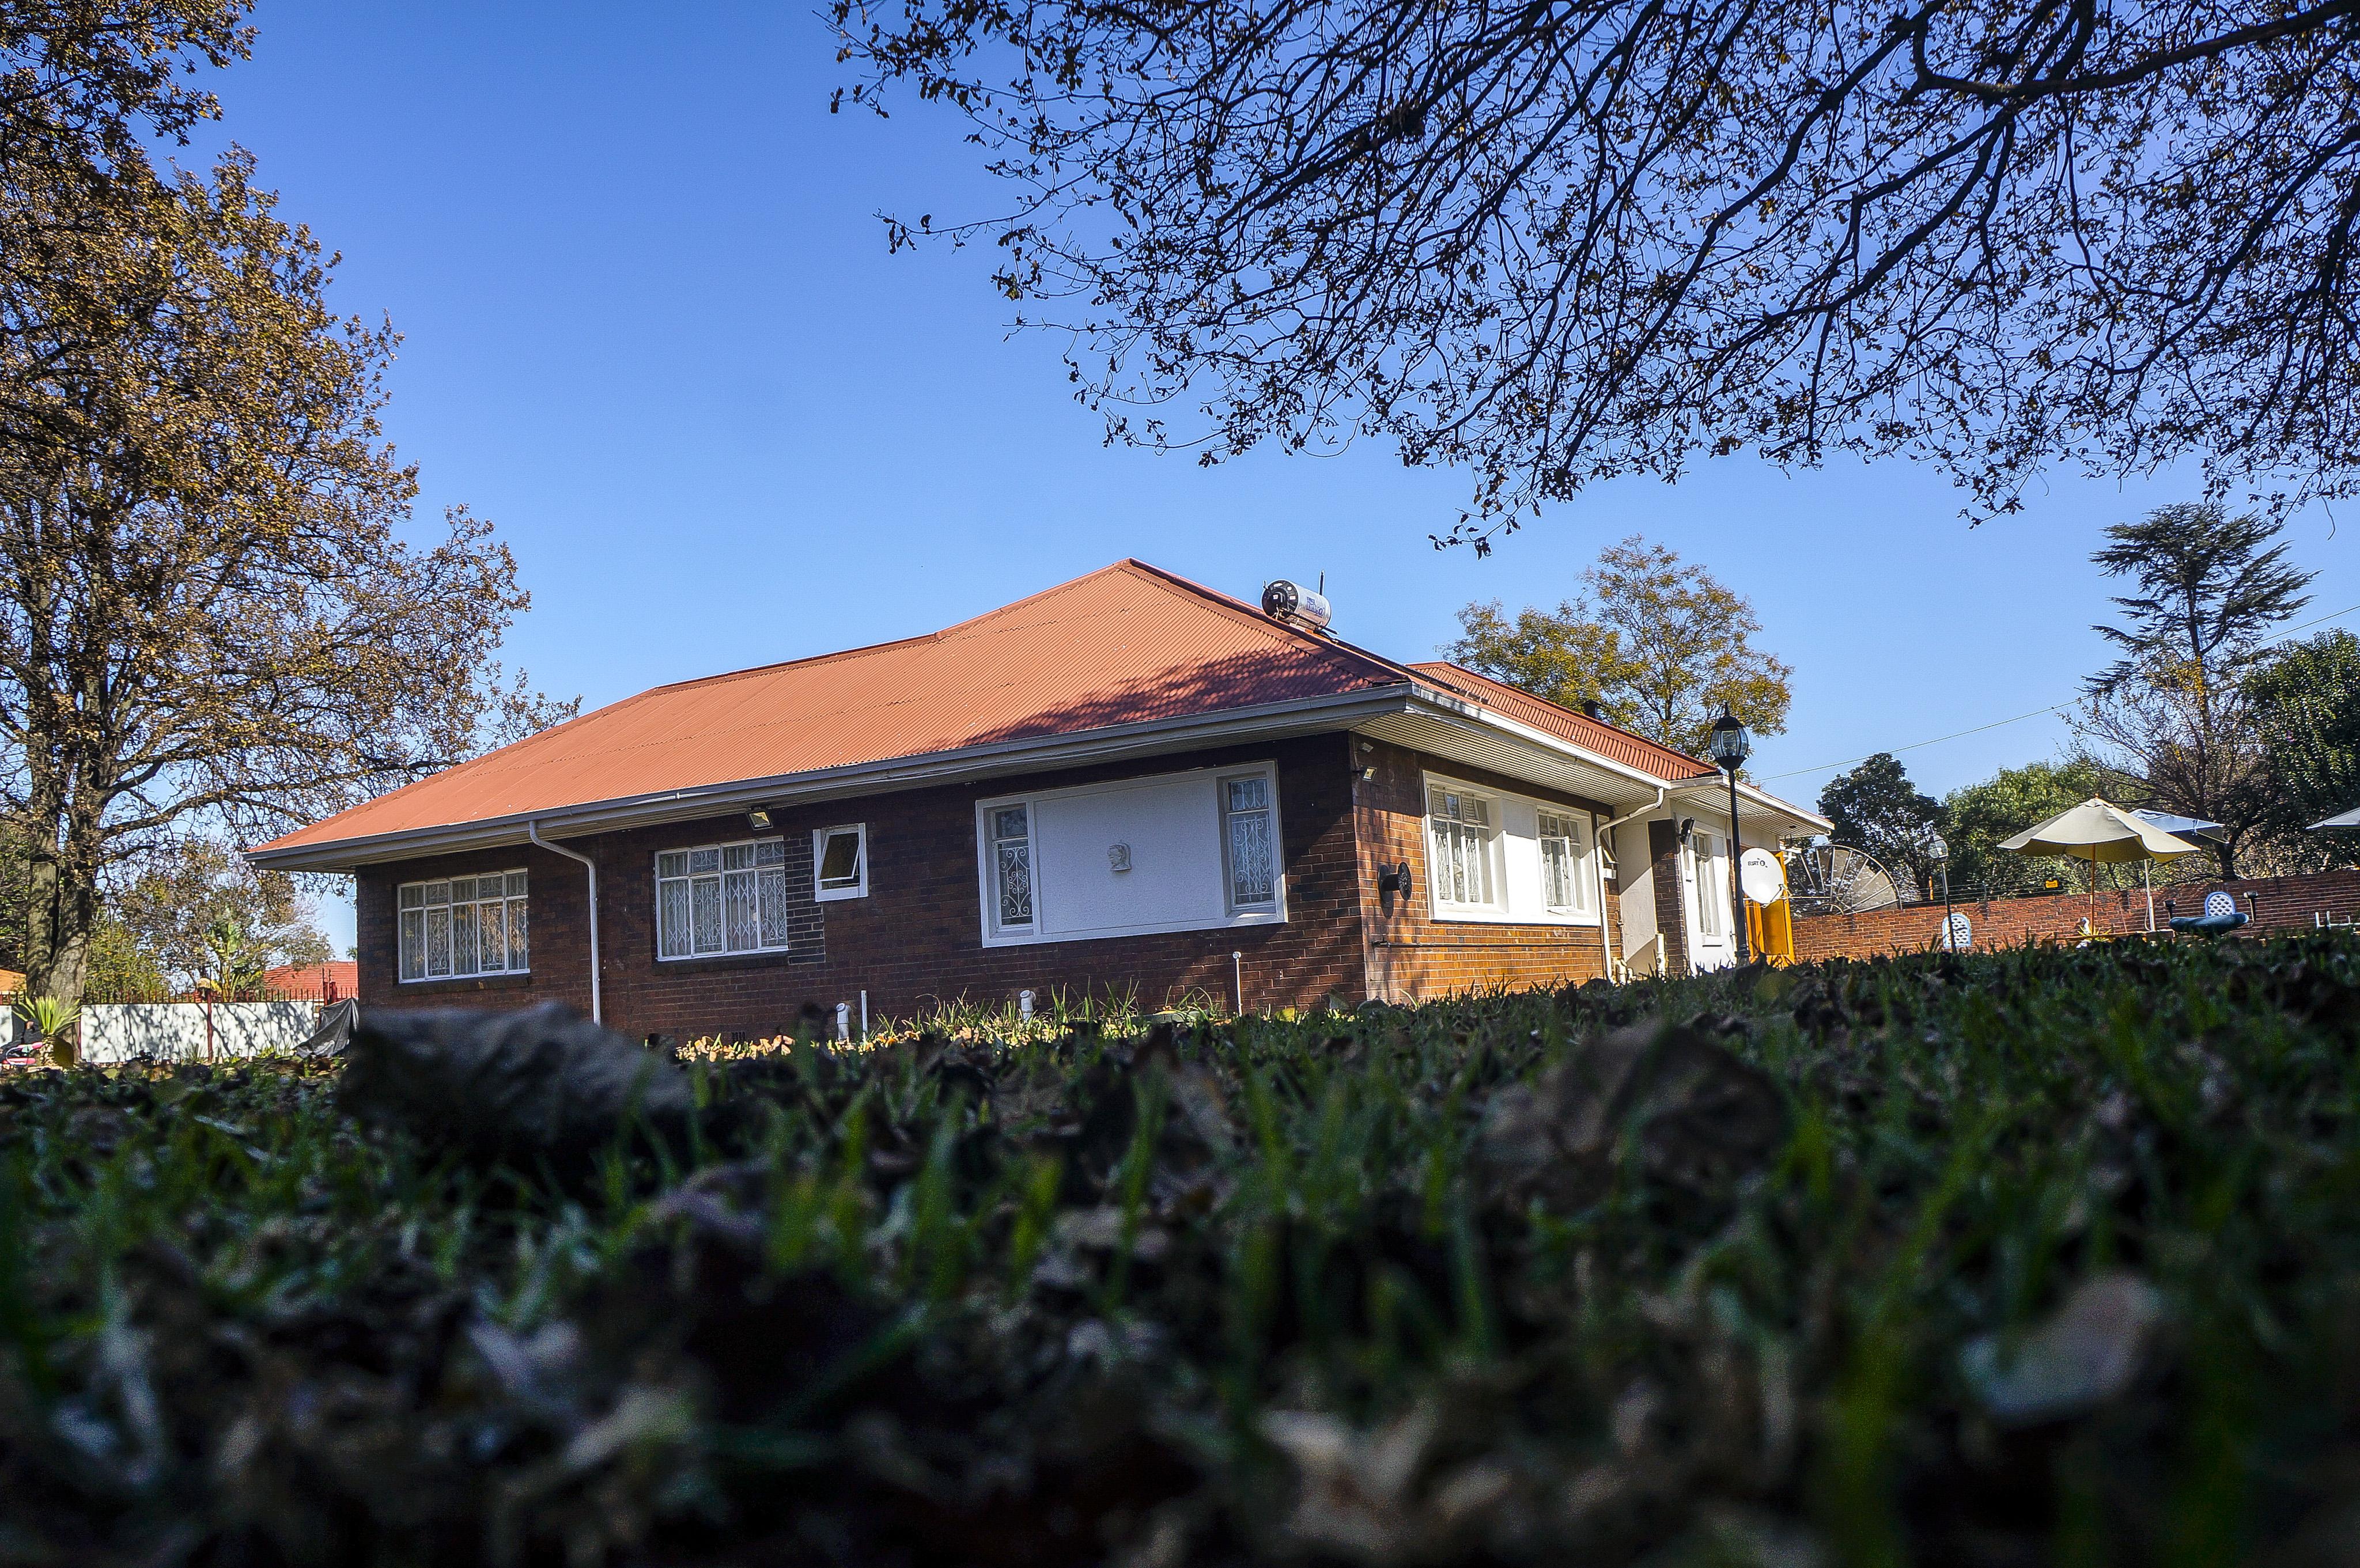 ACN international regency lodge